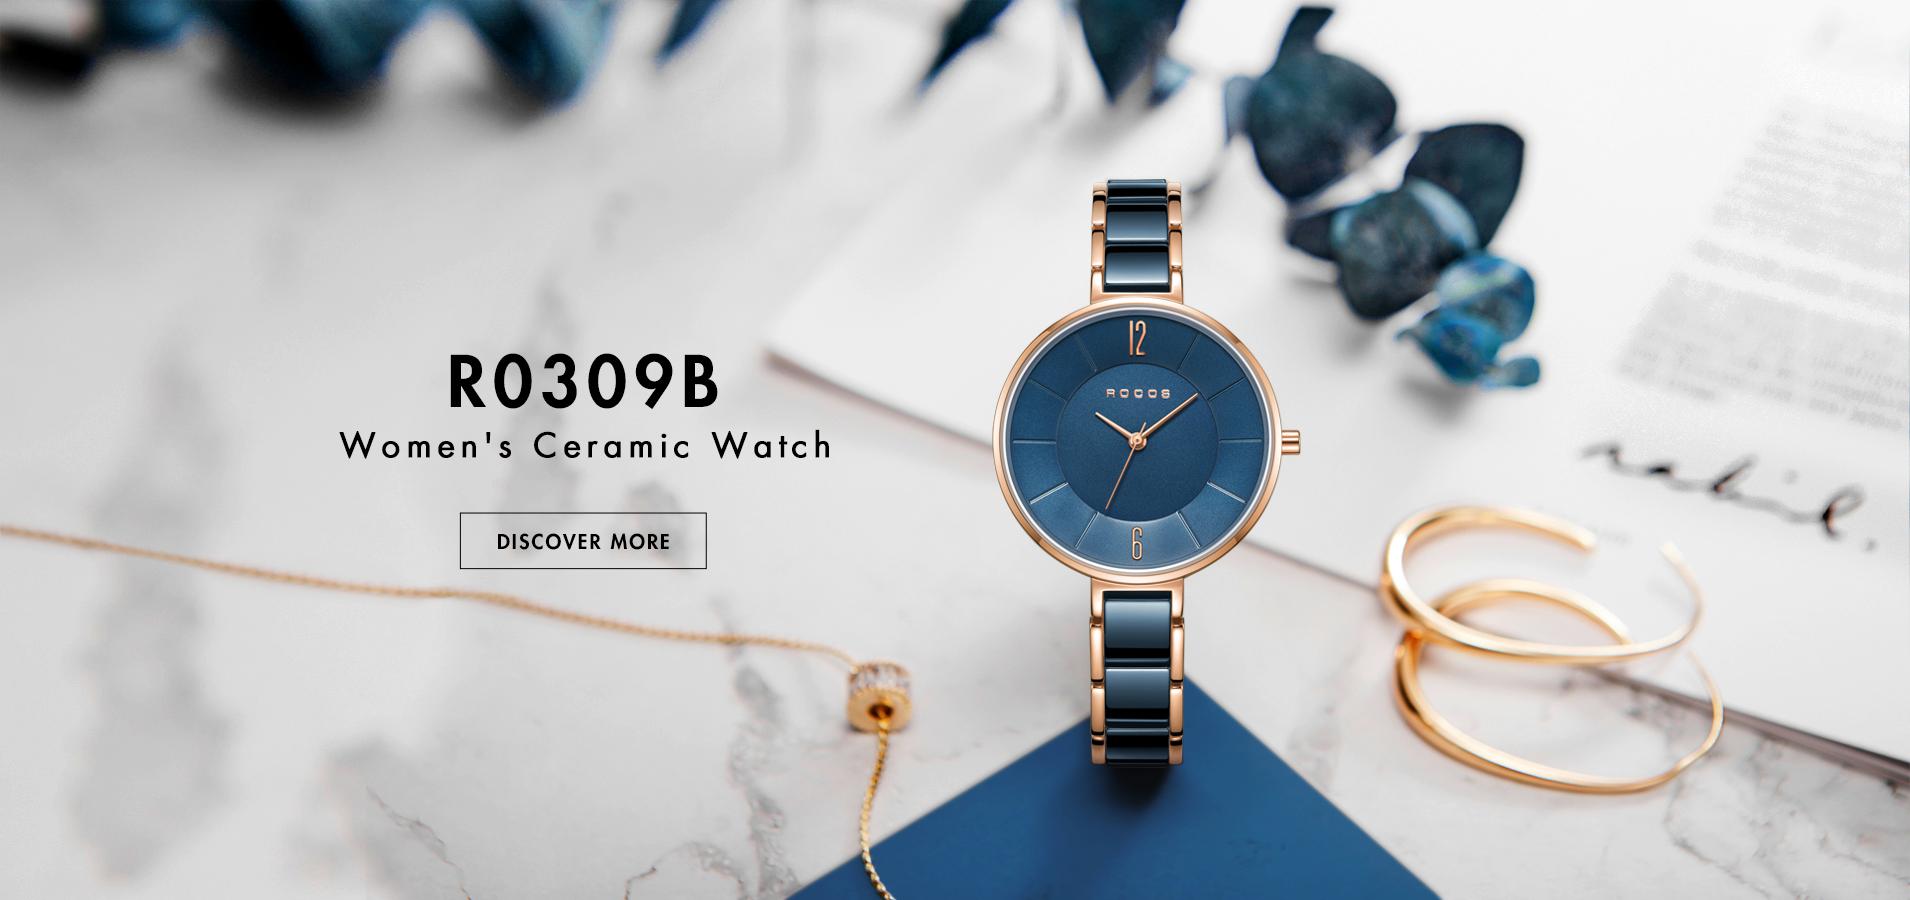 R0309B Women's Ceramic Watch